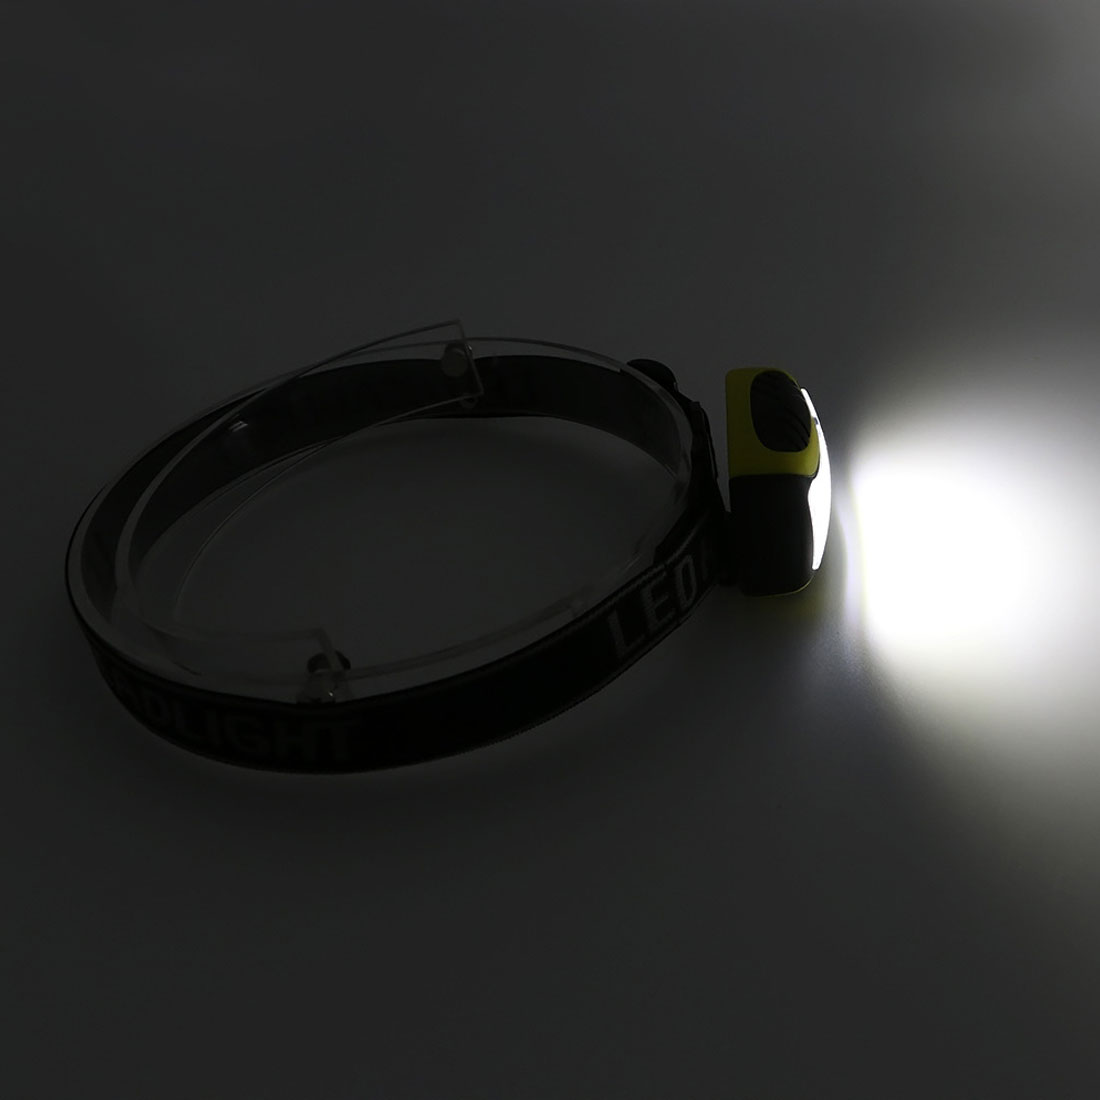 COB LED Headlamp Headlight Frontal Head Lamp 3 Mode Energy Saving Flashlight Linterna For Outdoor Sports Camping Fishing